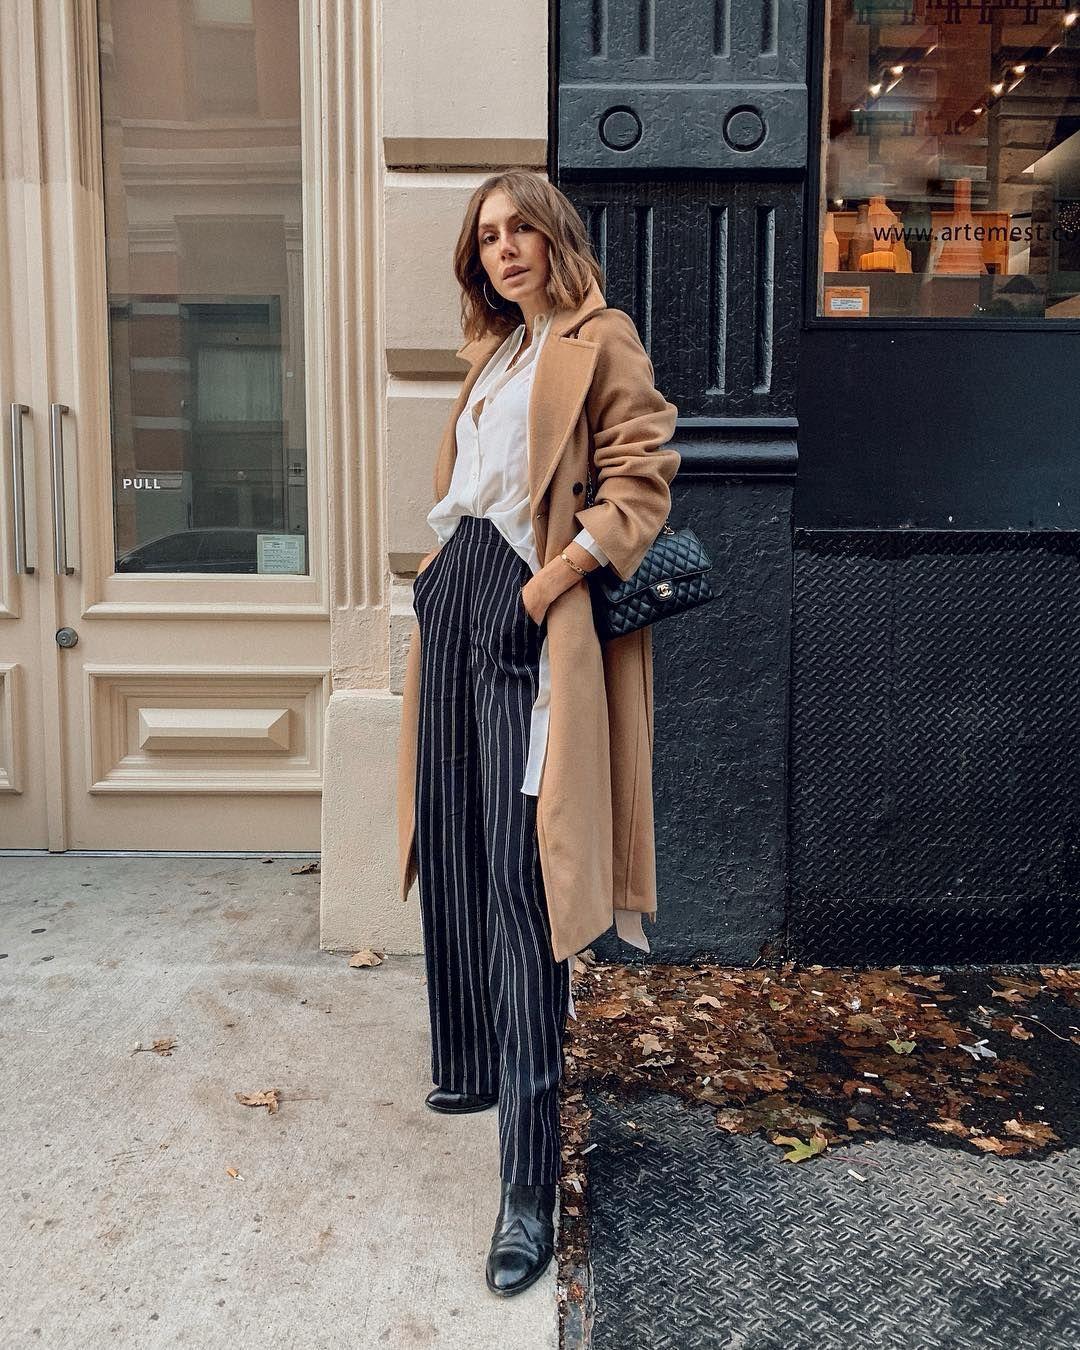 Feet Jelena Cikoja nude photos 2019